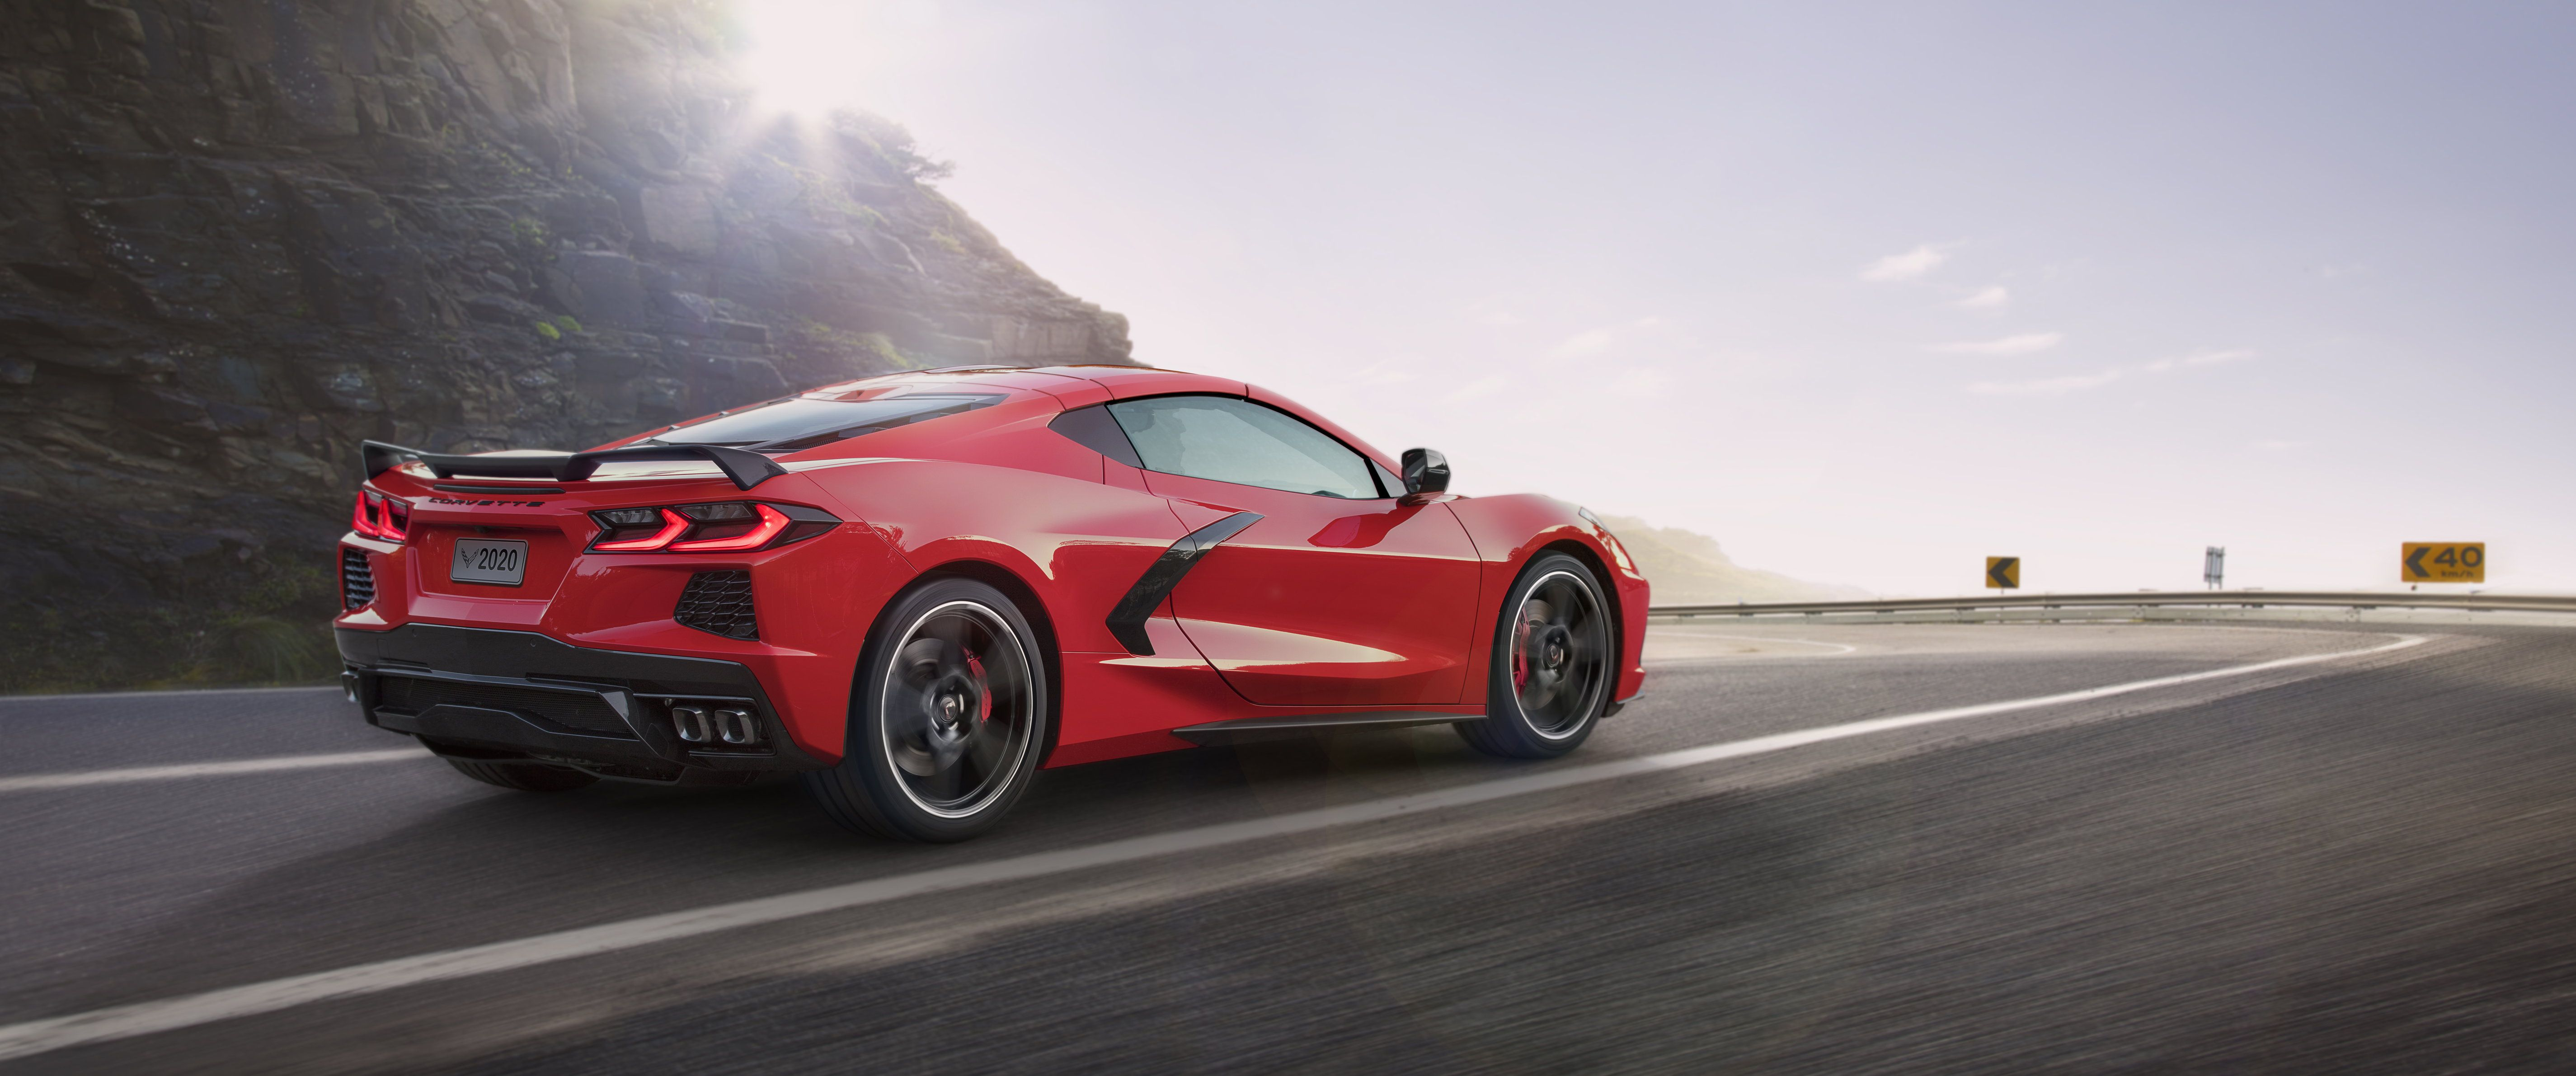 C8 Corvette Wallpapers - Top Free C8 Corvette Backgrounds - WallpaperAccess